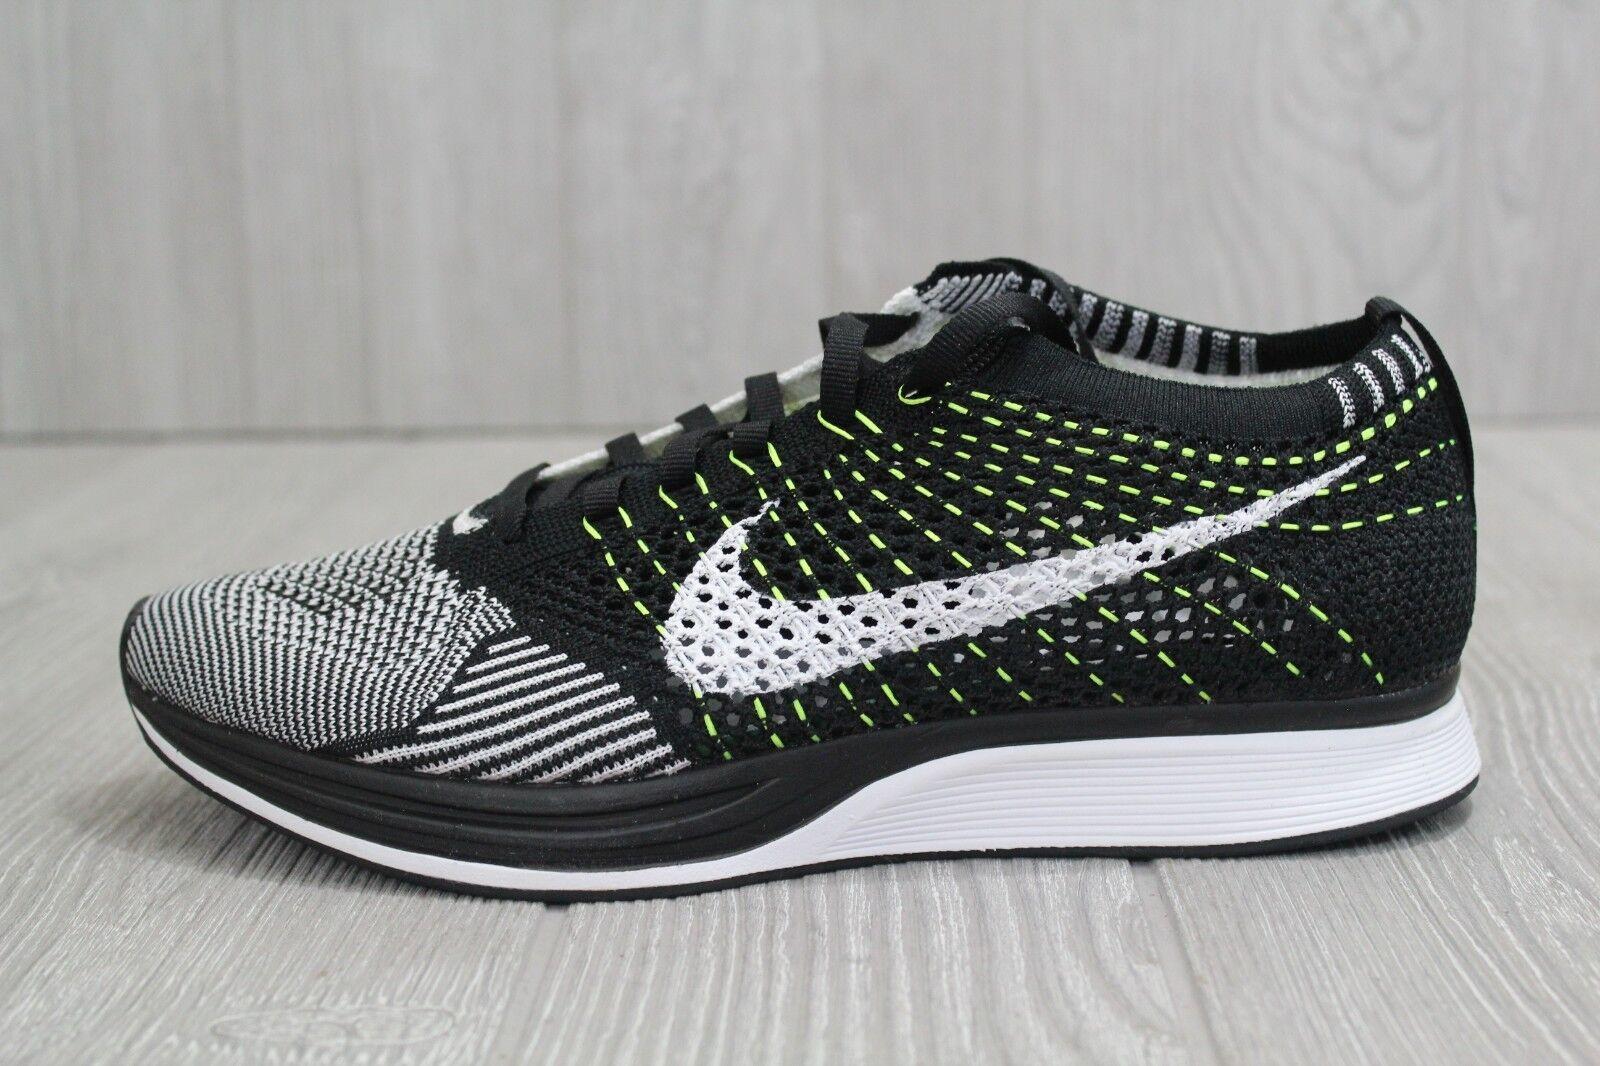 30 Nike Flyknit Racer Black White Shoes 526628 011 7.5 Mens 6 6.5 7 7.5 011 (Wmns 7.5-9) 9722fd